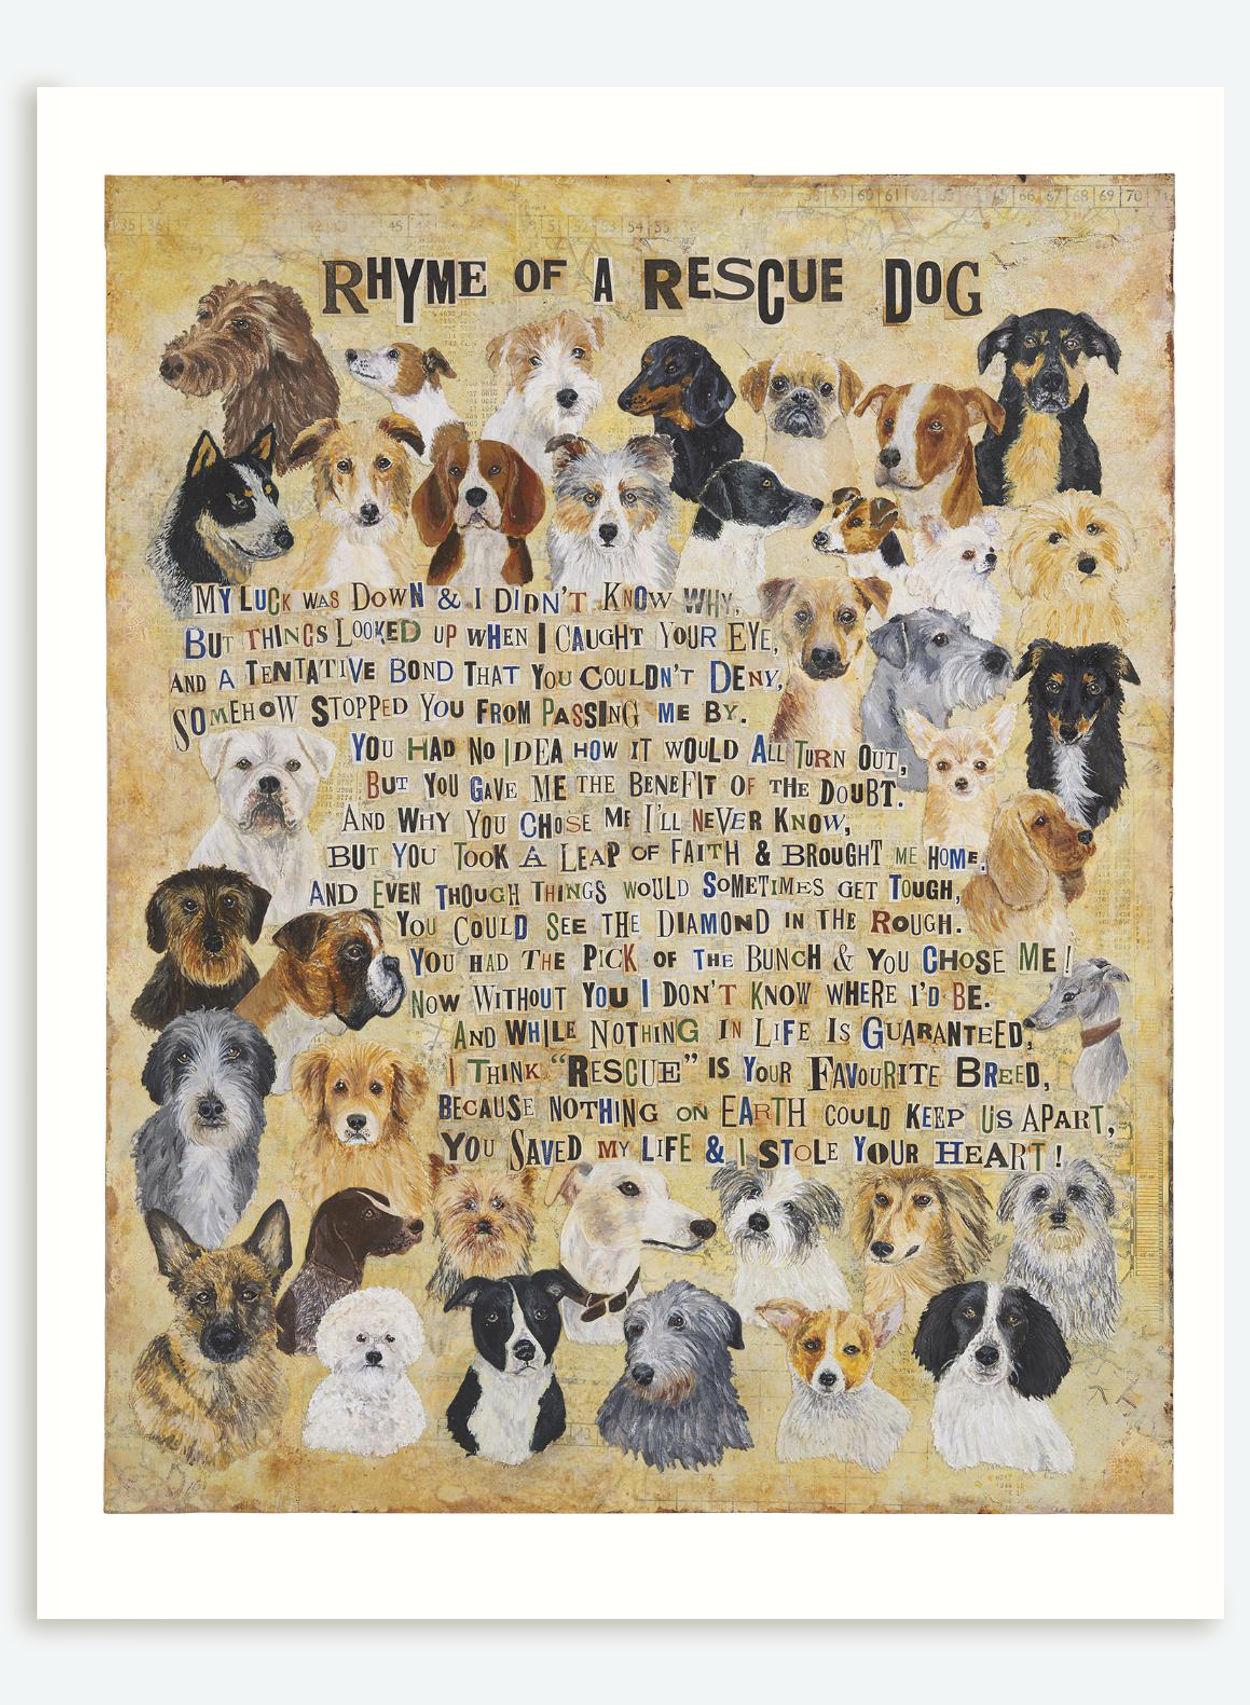 Rescue Dog Poem Print   The Enlightened Hound